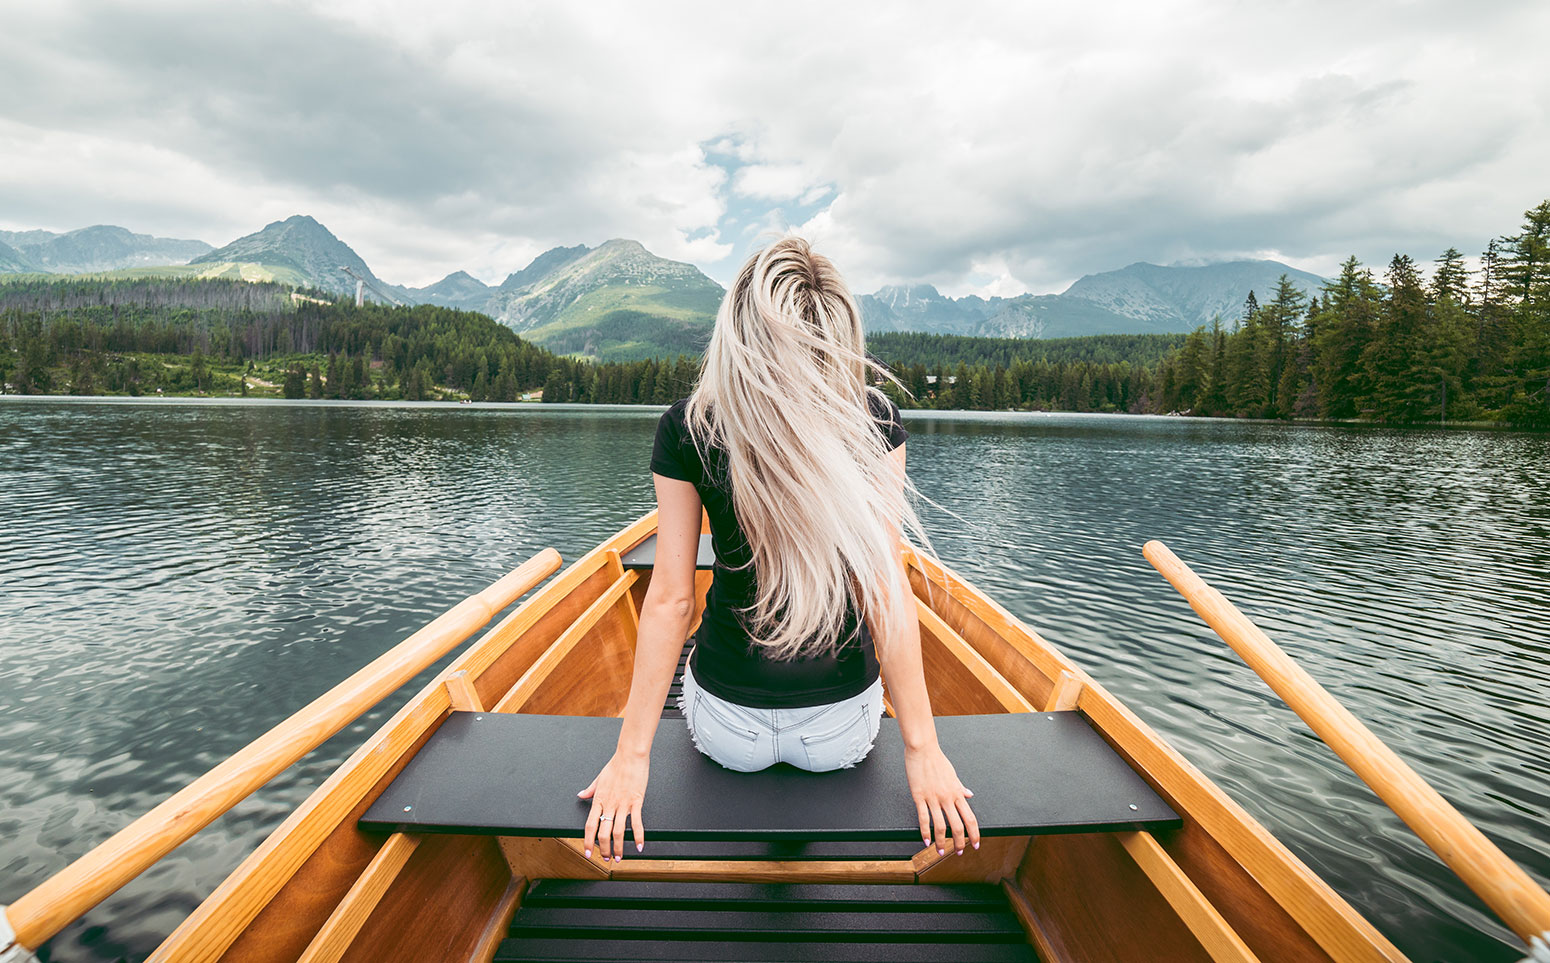 Young Blonde Woman Enjoying a Rowing Boat